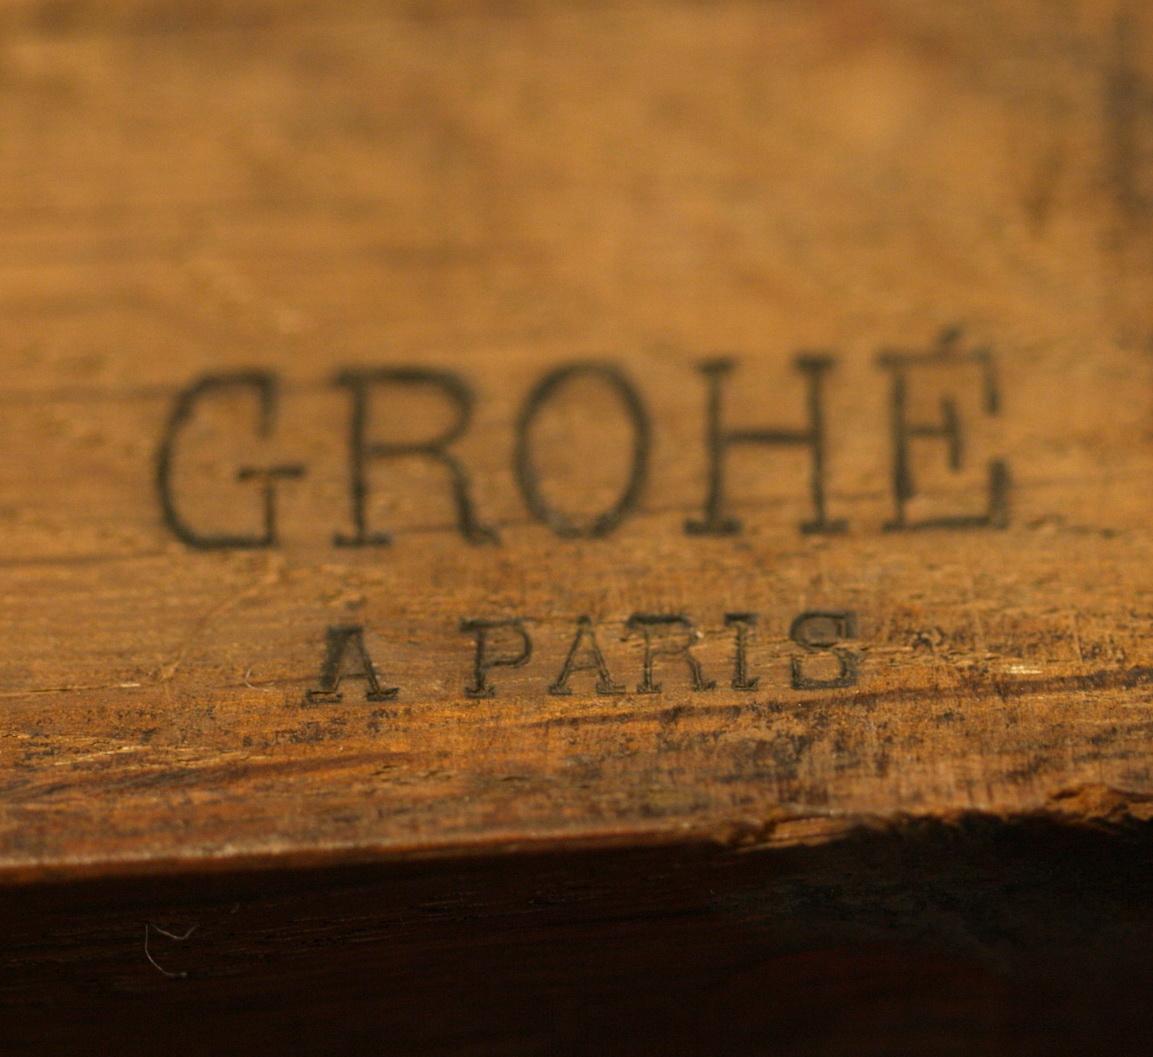 GROHE A Paris circa 1847